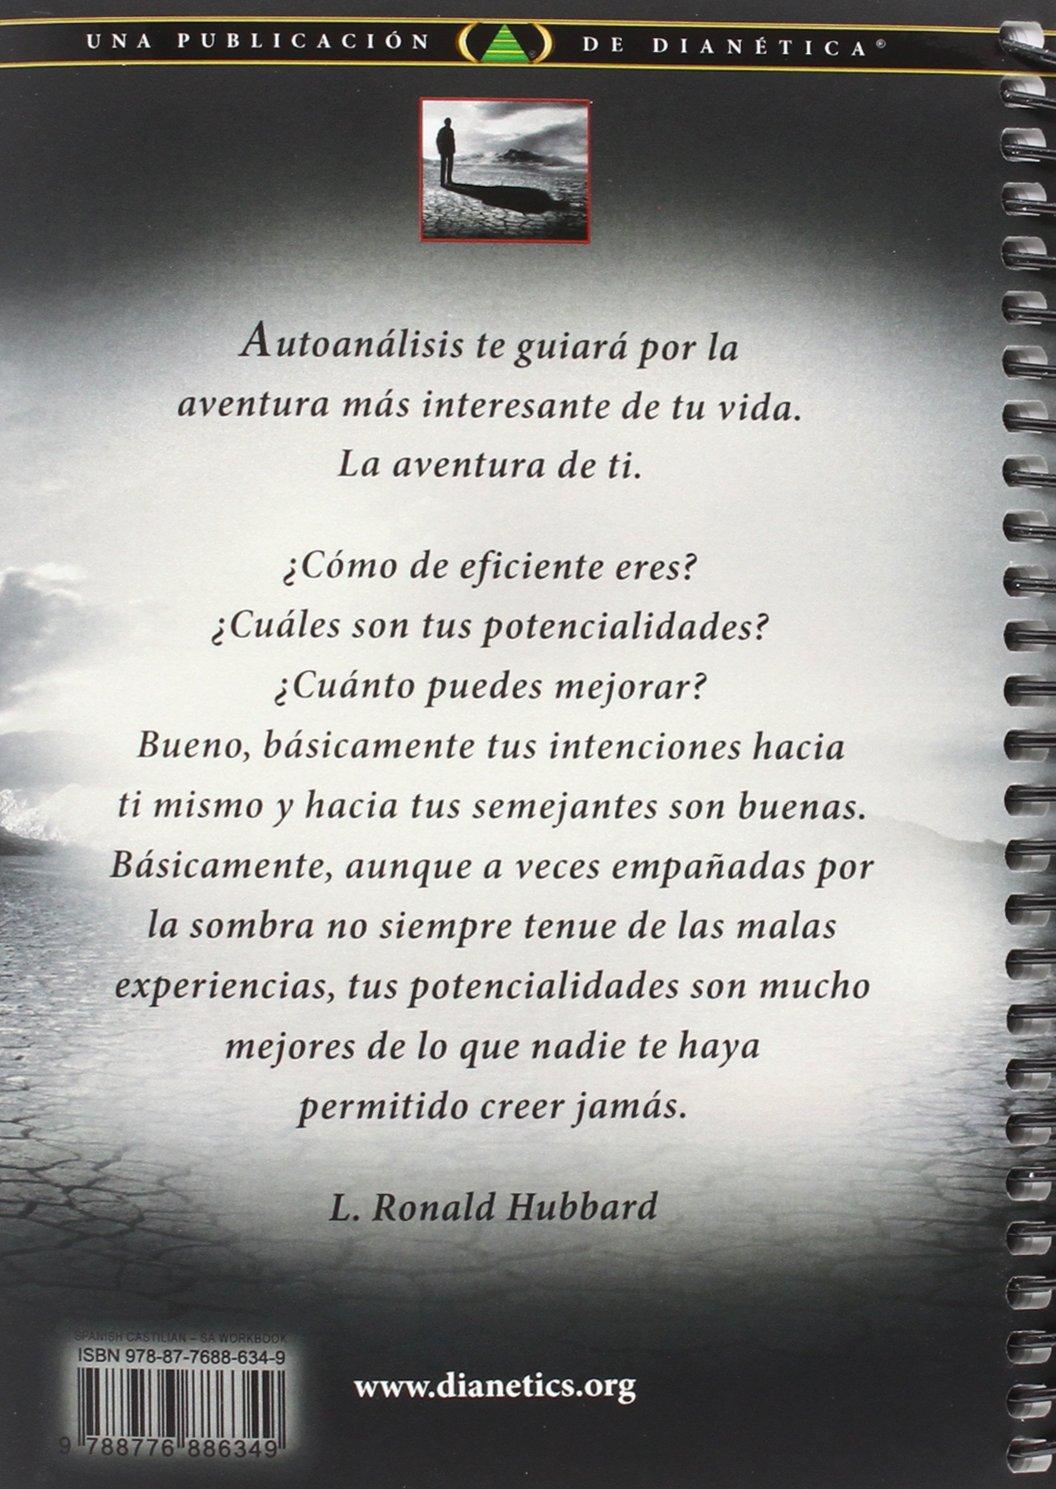 AUTOANÁLISIS: Amazon.es: Hubbard, L. Ronald: Libros